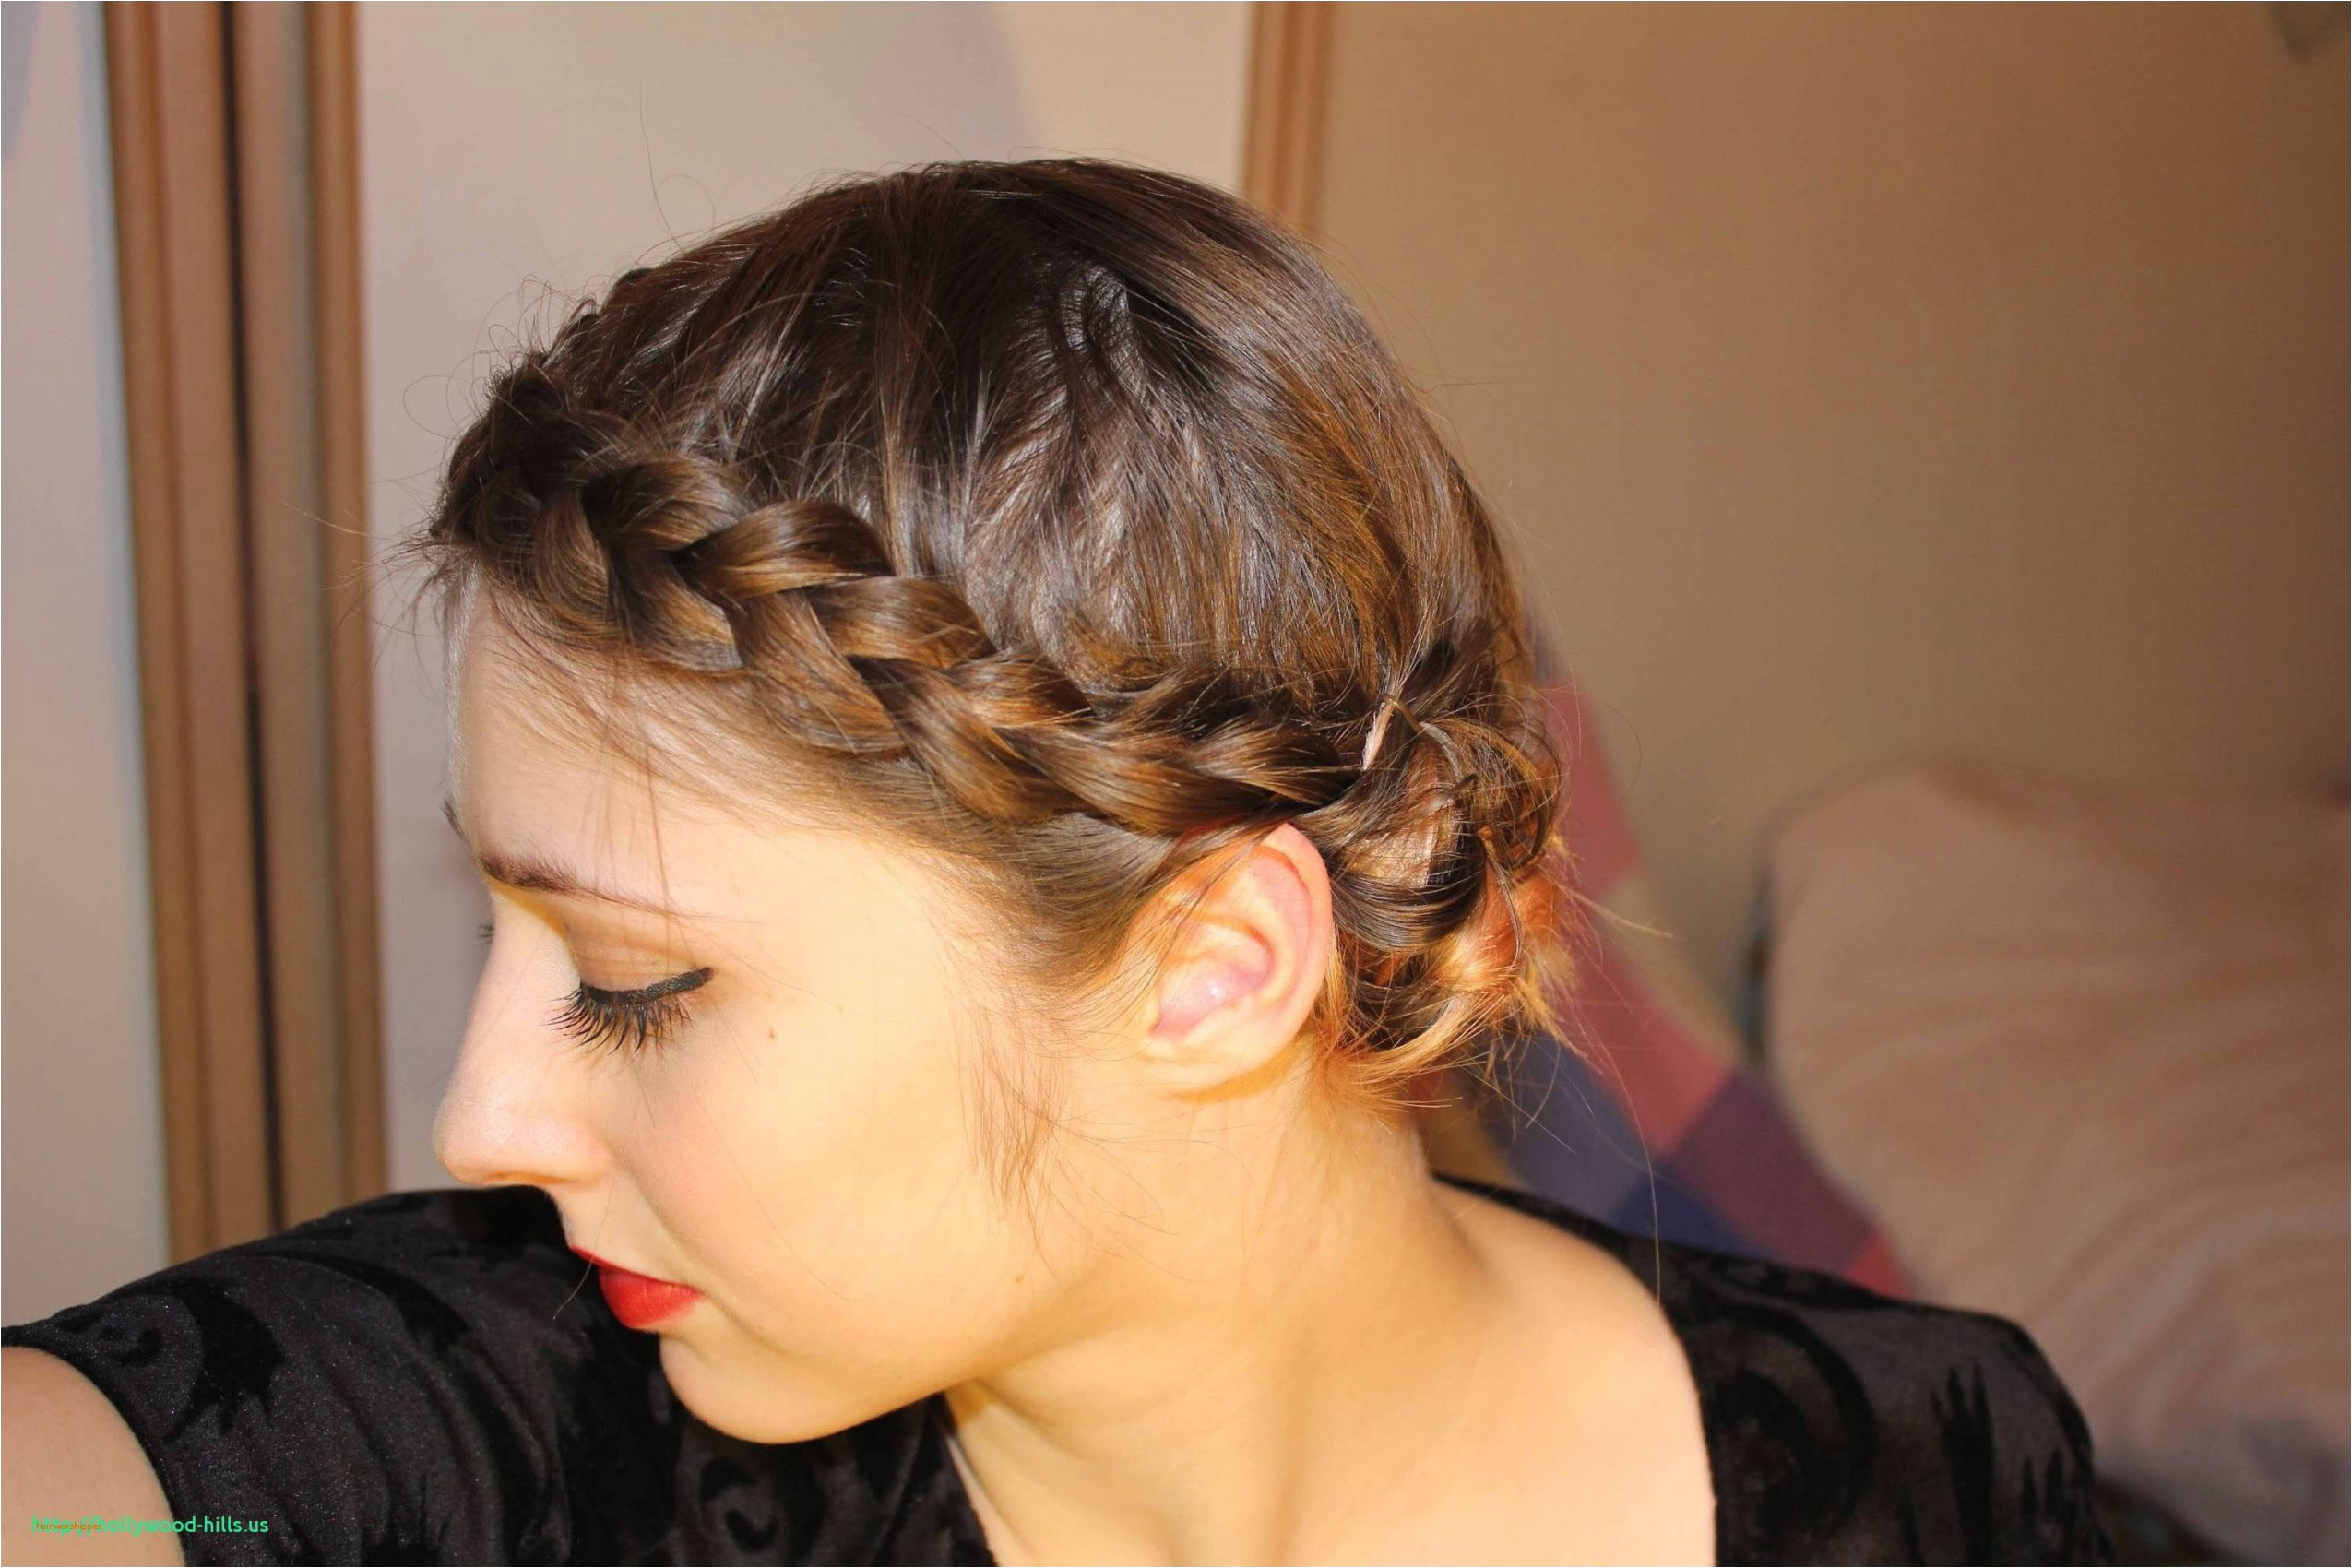 Fresh Cute Hairstyles for Medium Length Hair Youtube Unique Hairstyles for Short Thin Hair Youtube Lovely